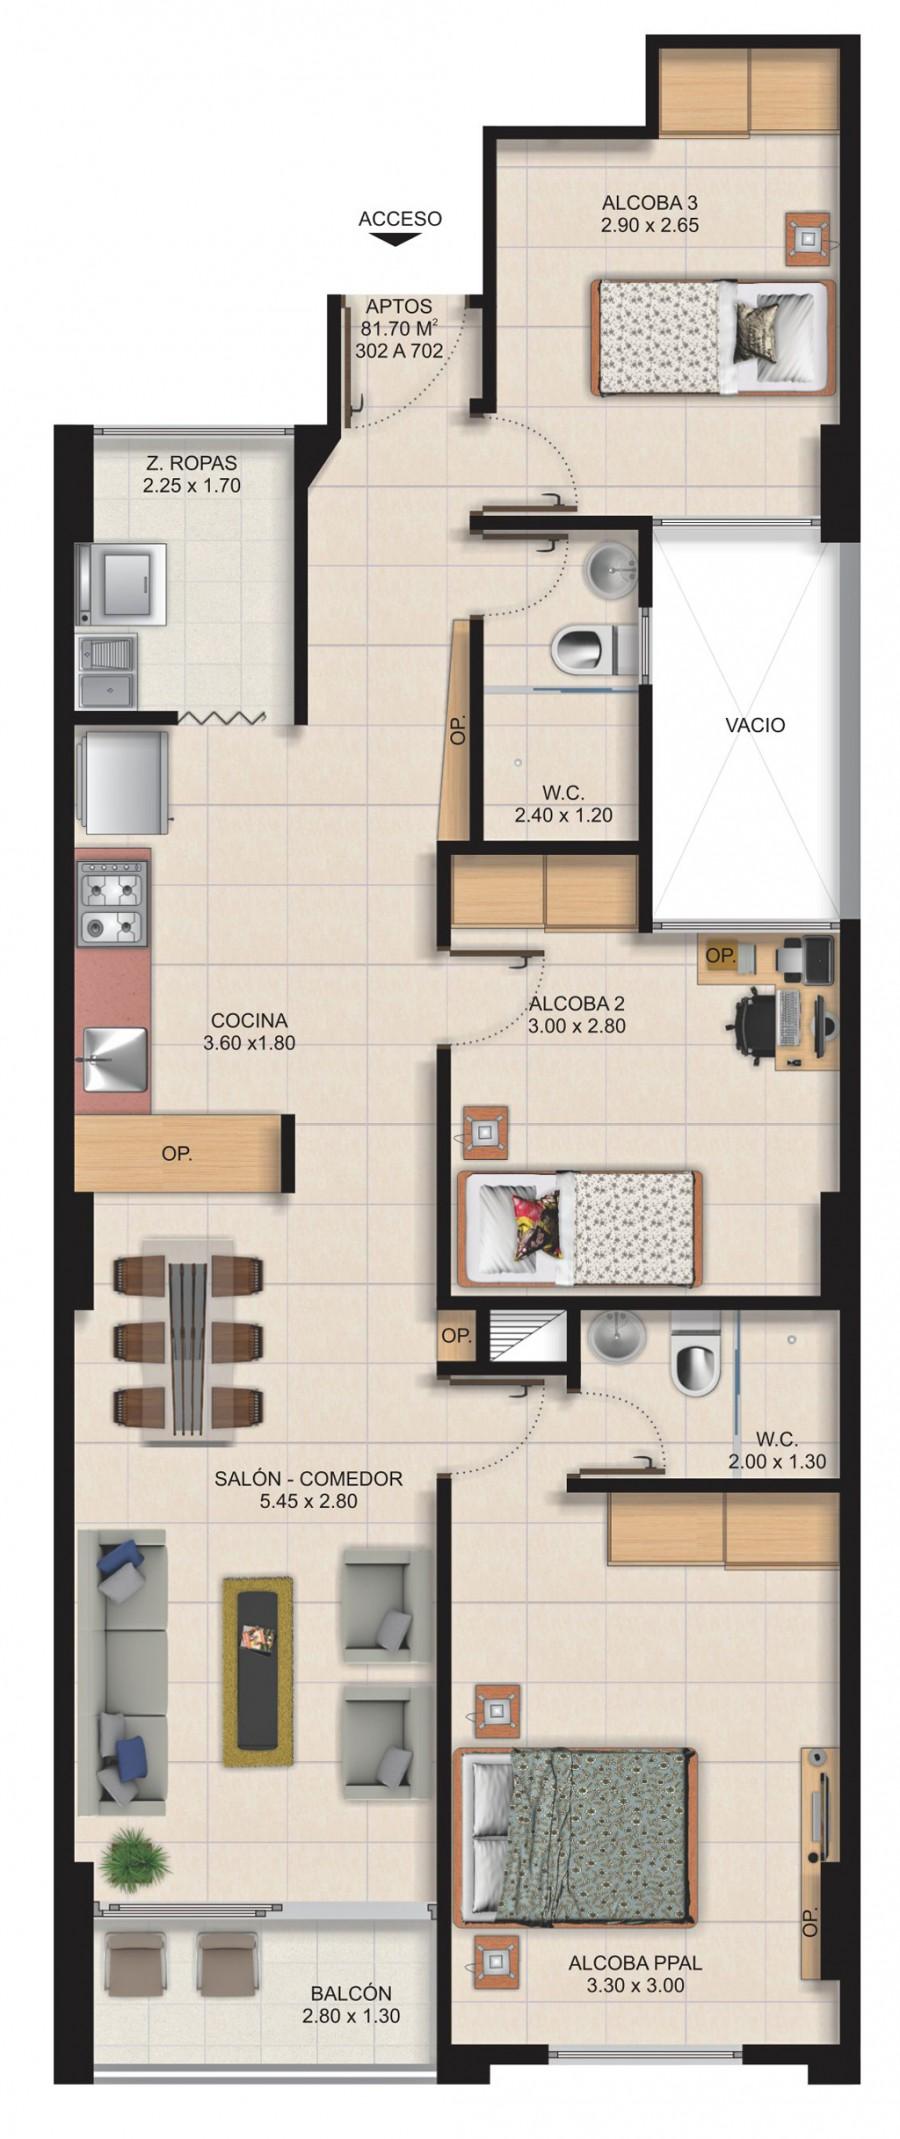 Planta Típica Apartamento Tipo B (81.70m2) Apartamentos San Arcangel